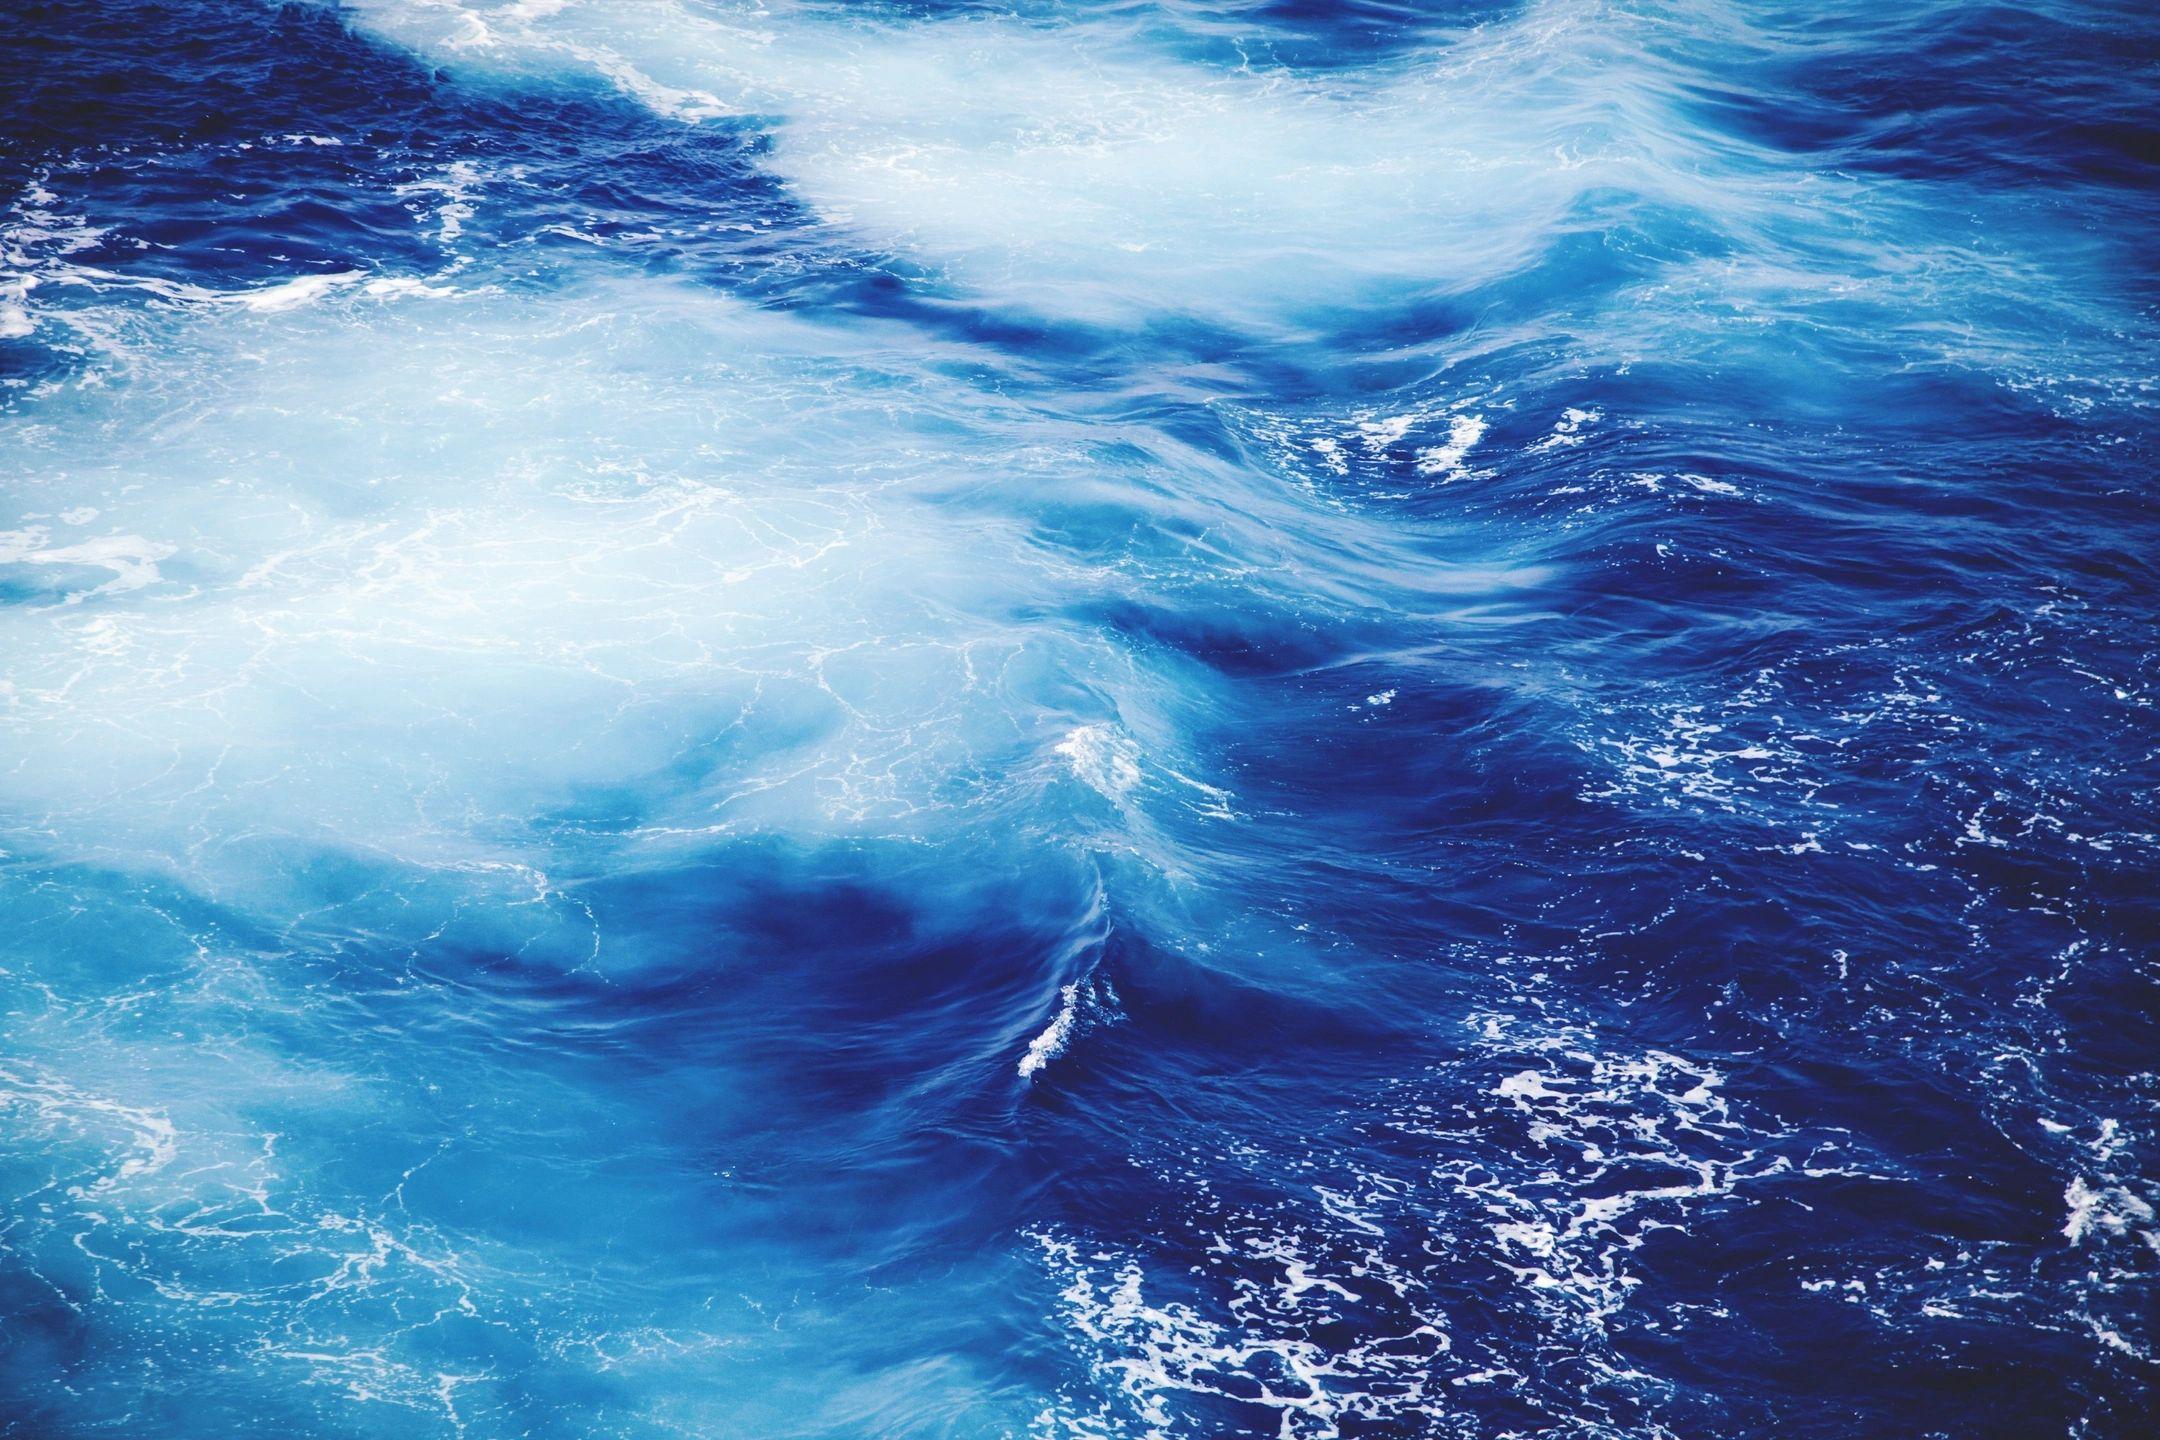 Varun Mudra | Water Mudra | Mudra Activation